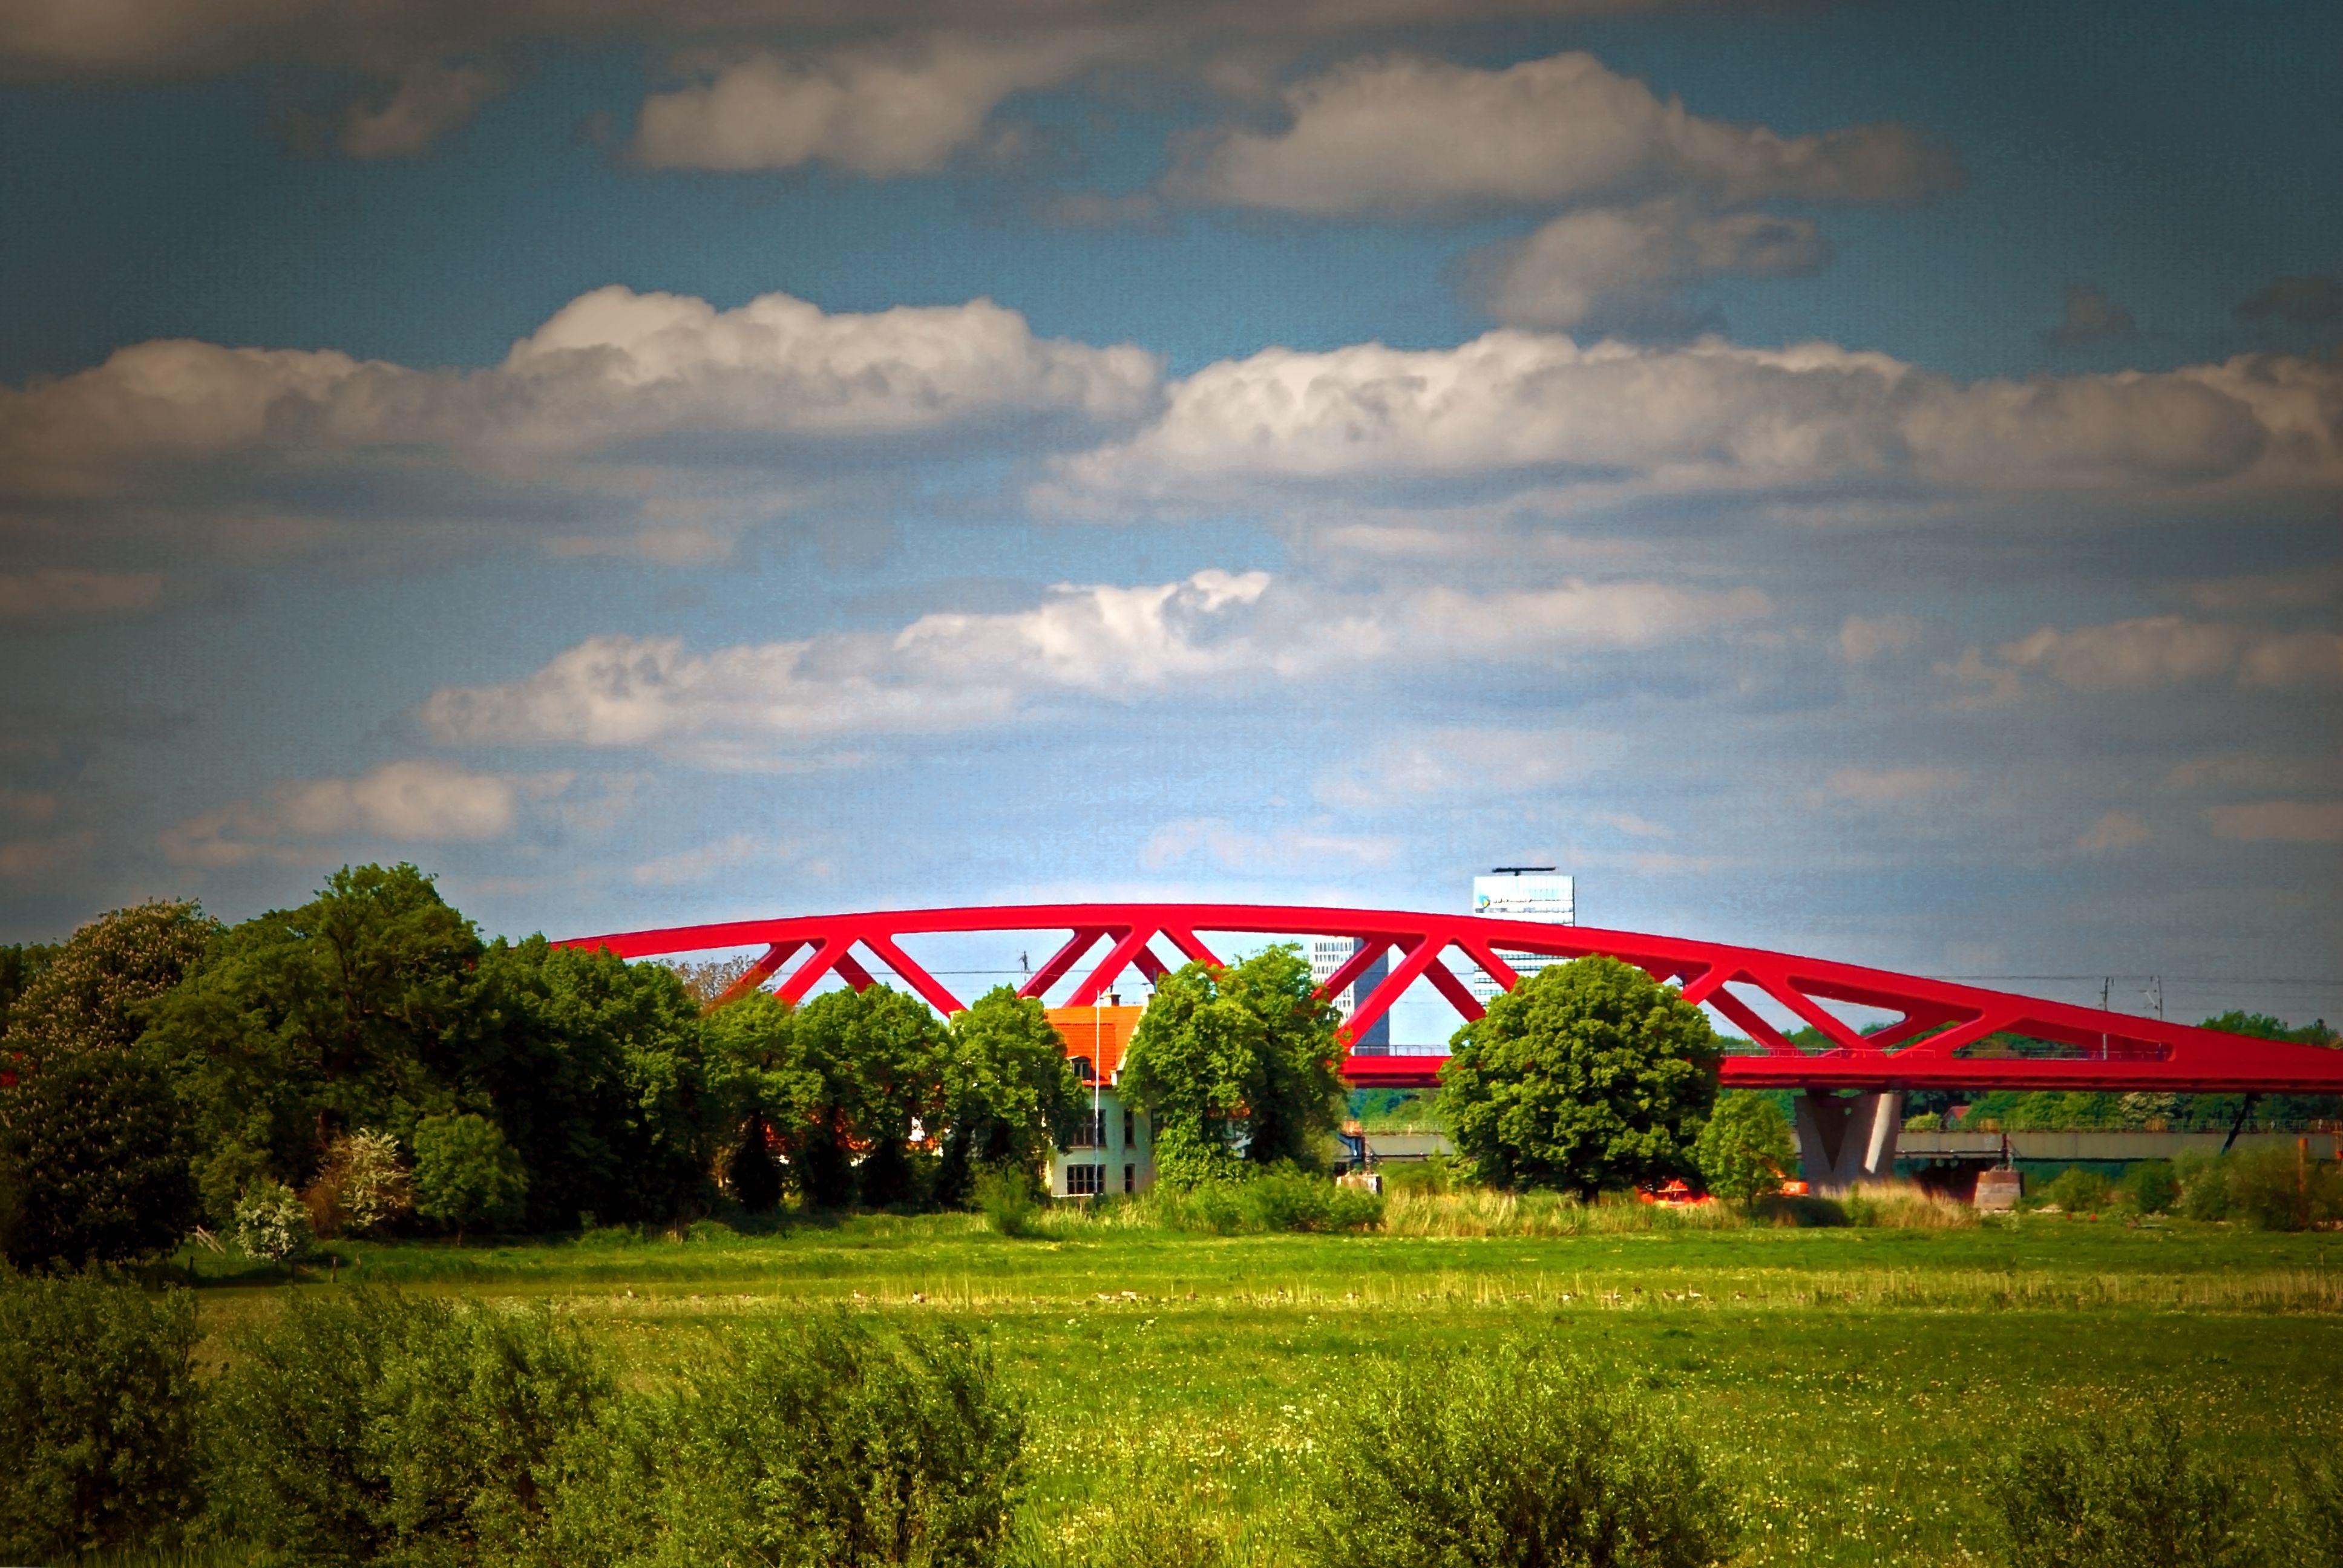 Big Red Railway bridge (Hanzeboog) crossing the IJssel river between Zwolle and Hattem. Photo: Egwin Frieling